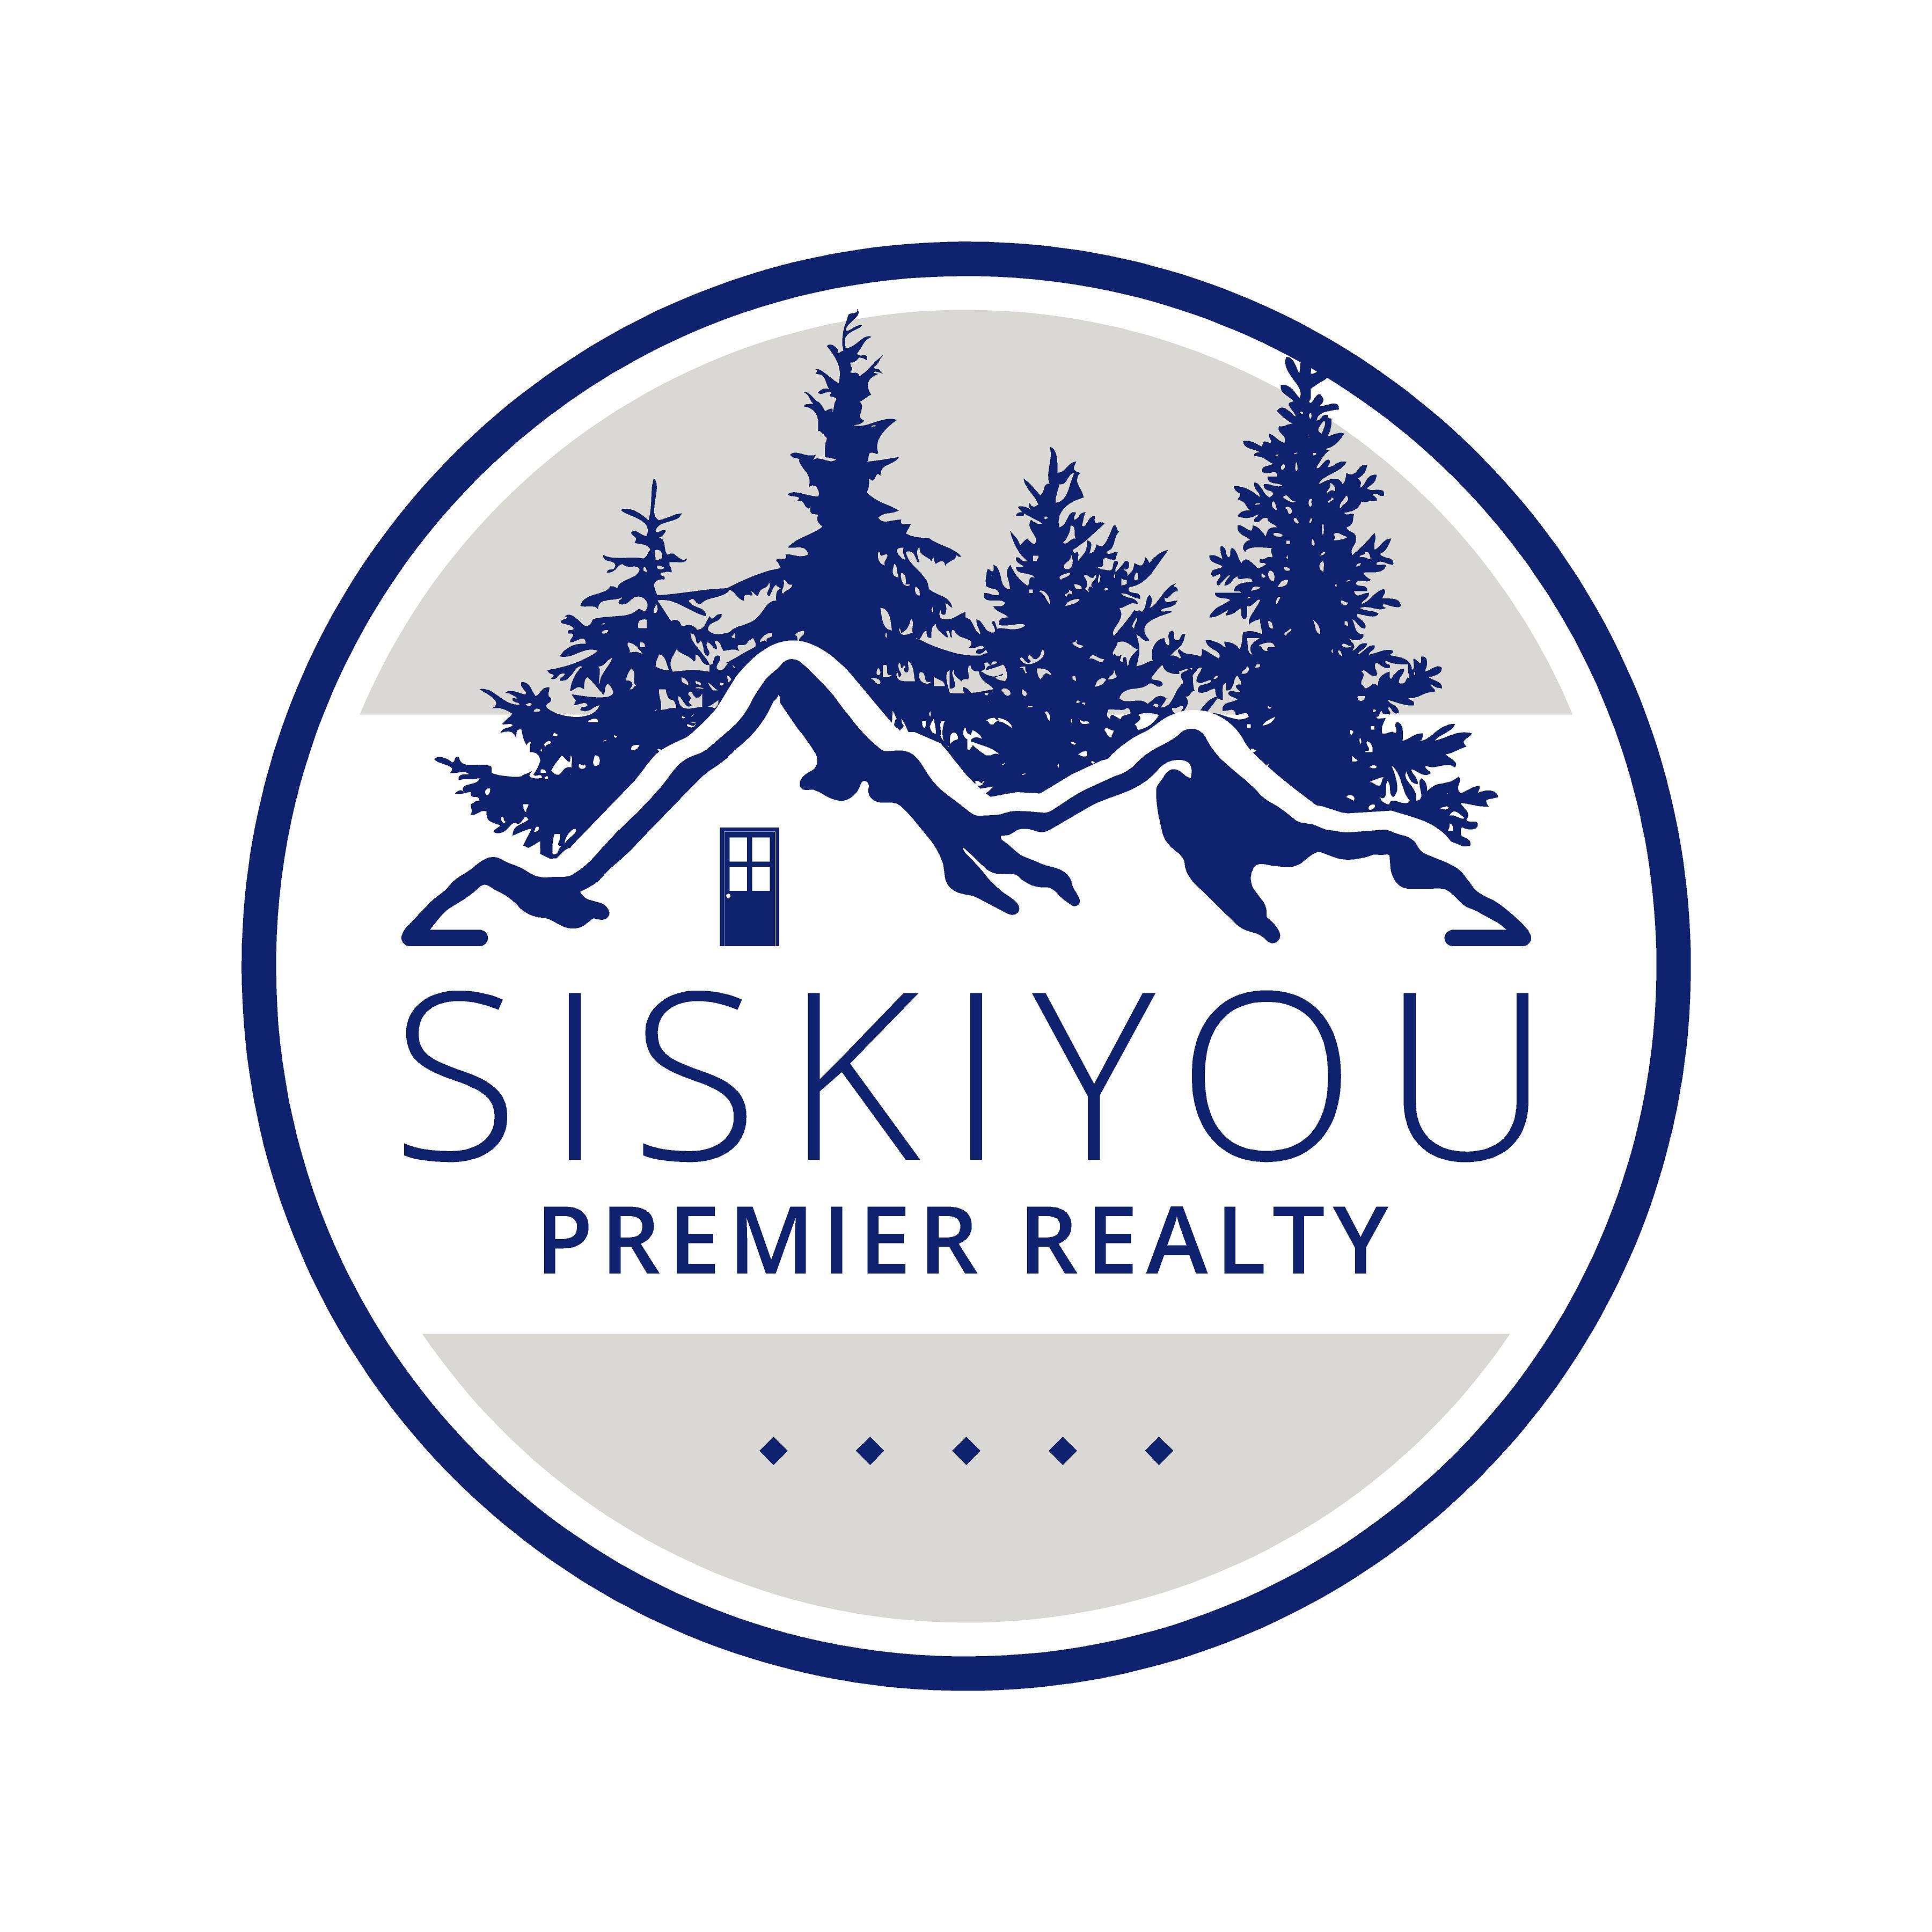 Siskiyou Premier Realty image 3